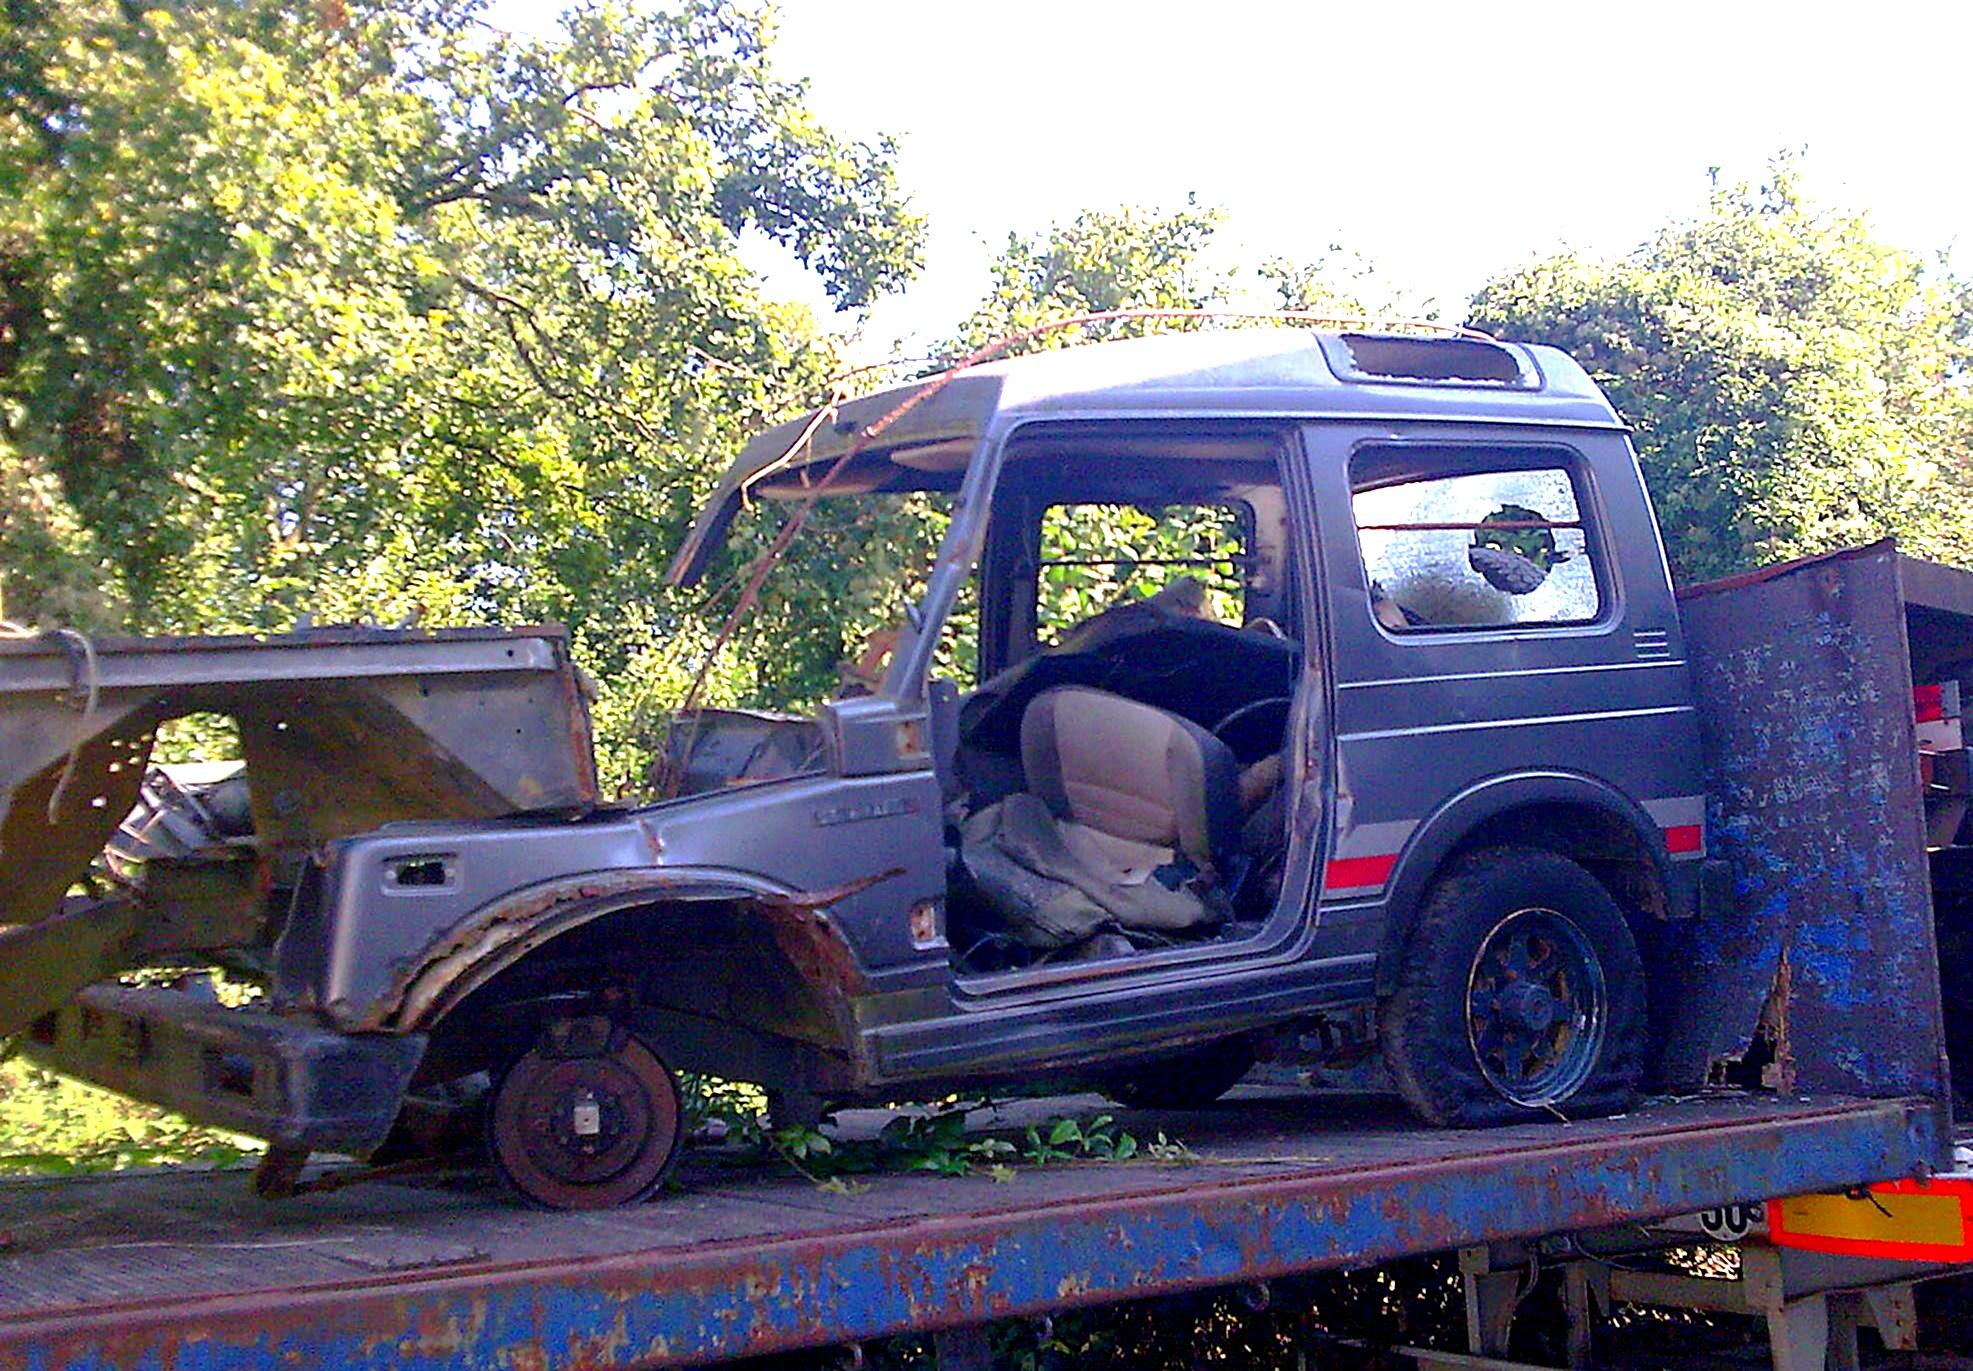 Car Repair Shop >> File:Destroyed Suzuki Samurai.jpg - Wikimedia Commons